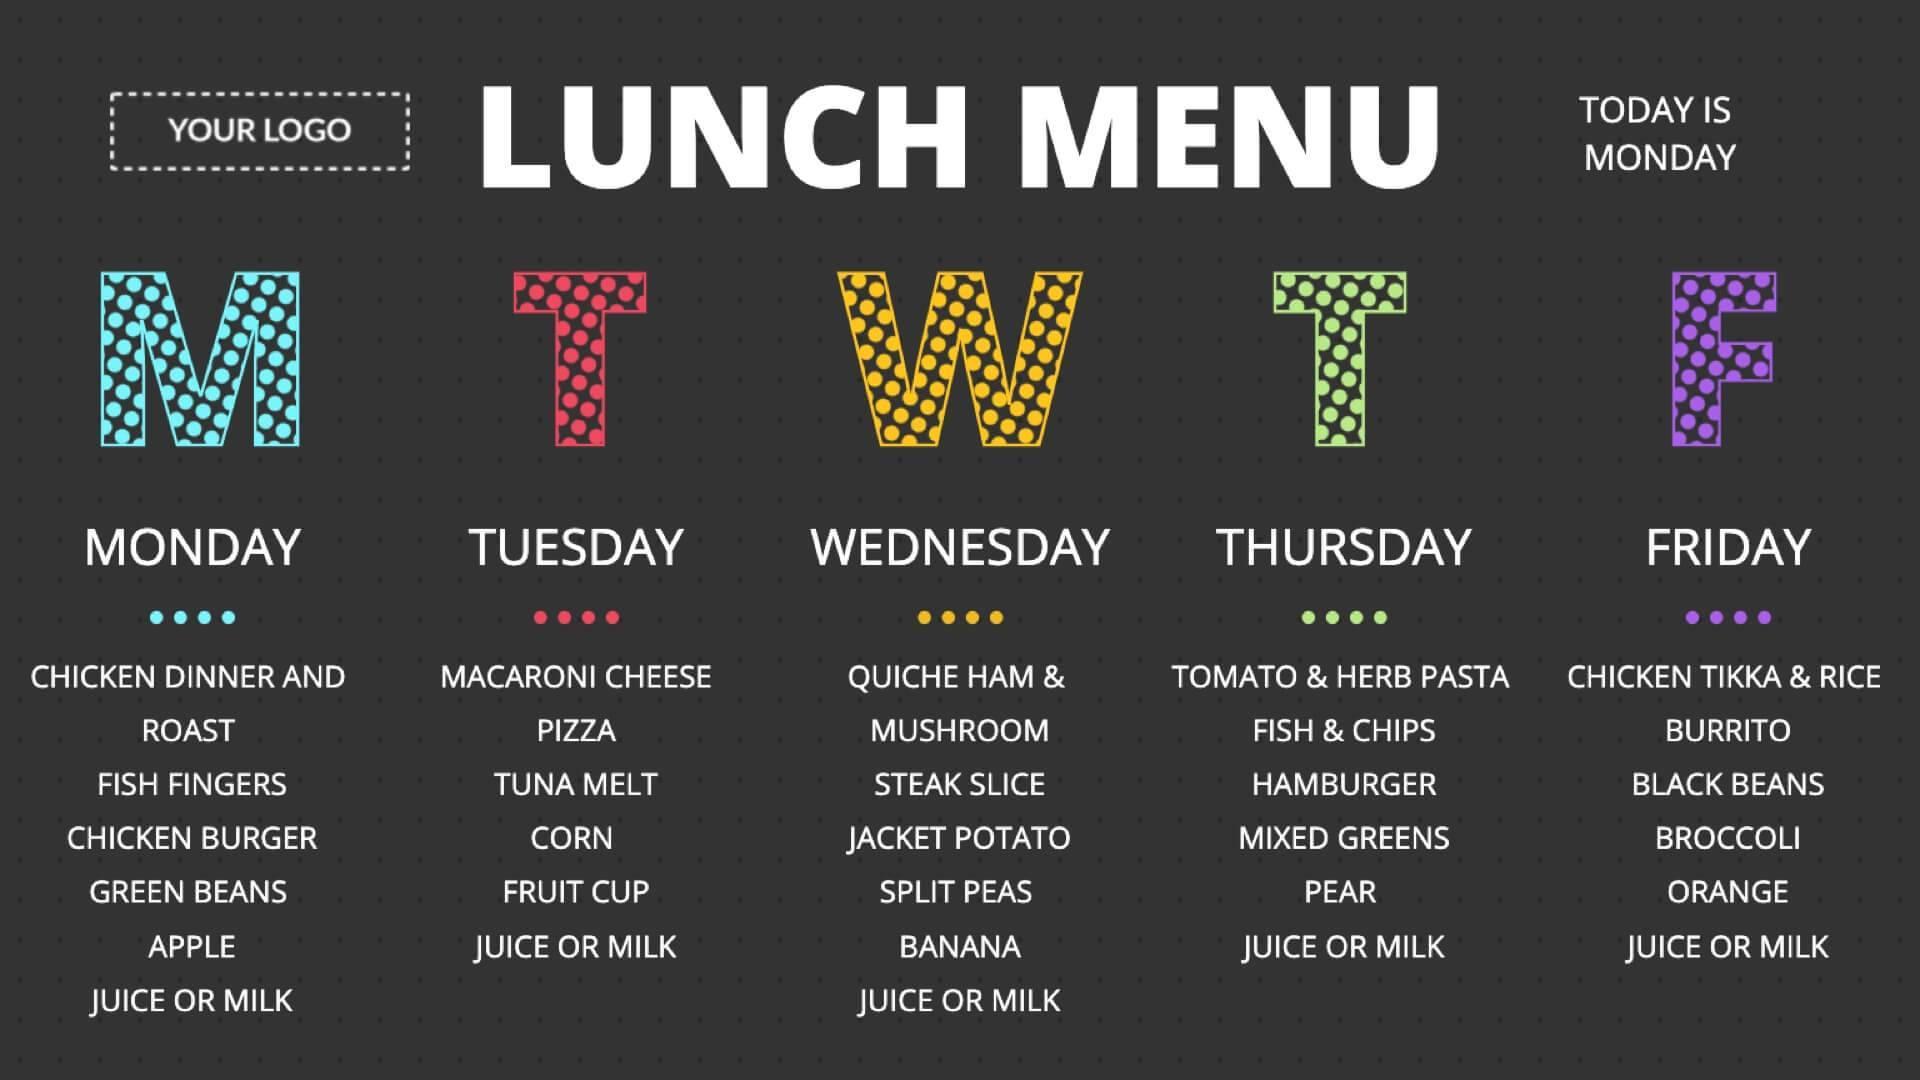 Lunch Menu Digital Signage Template